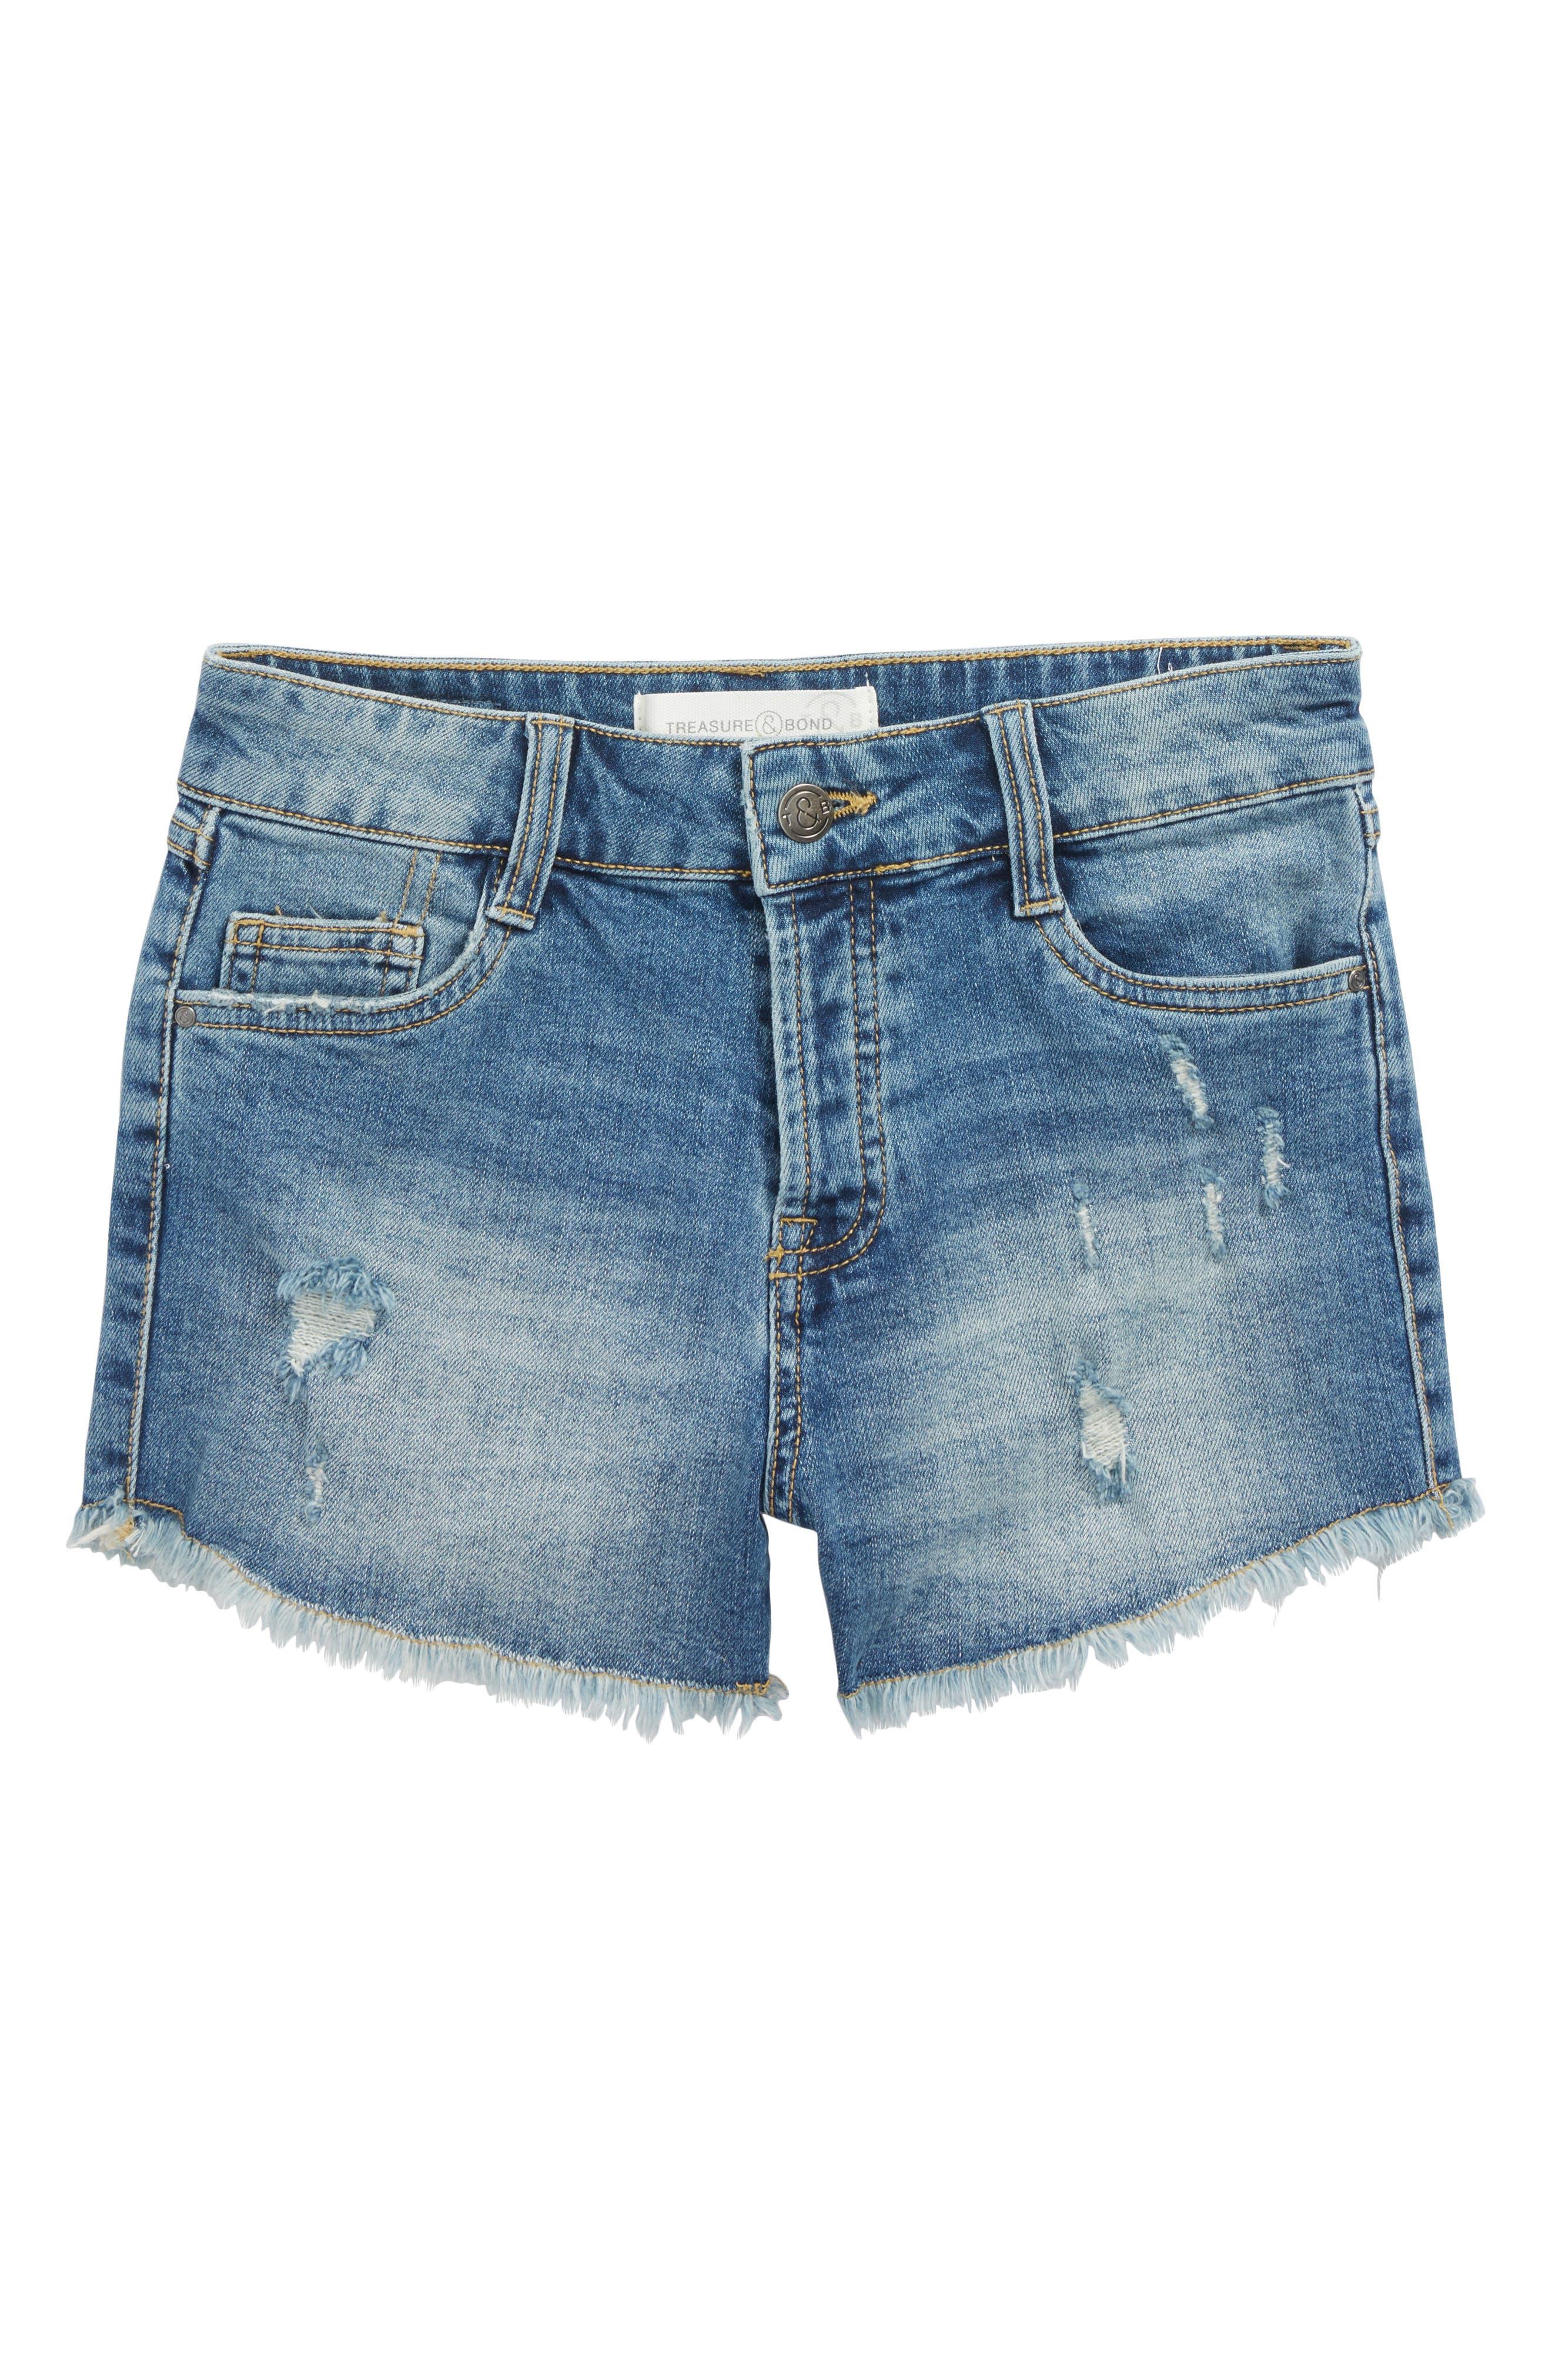 Distressed Cutoff Denim Shorts,                         Main,                         color, Old School Wash